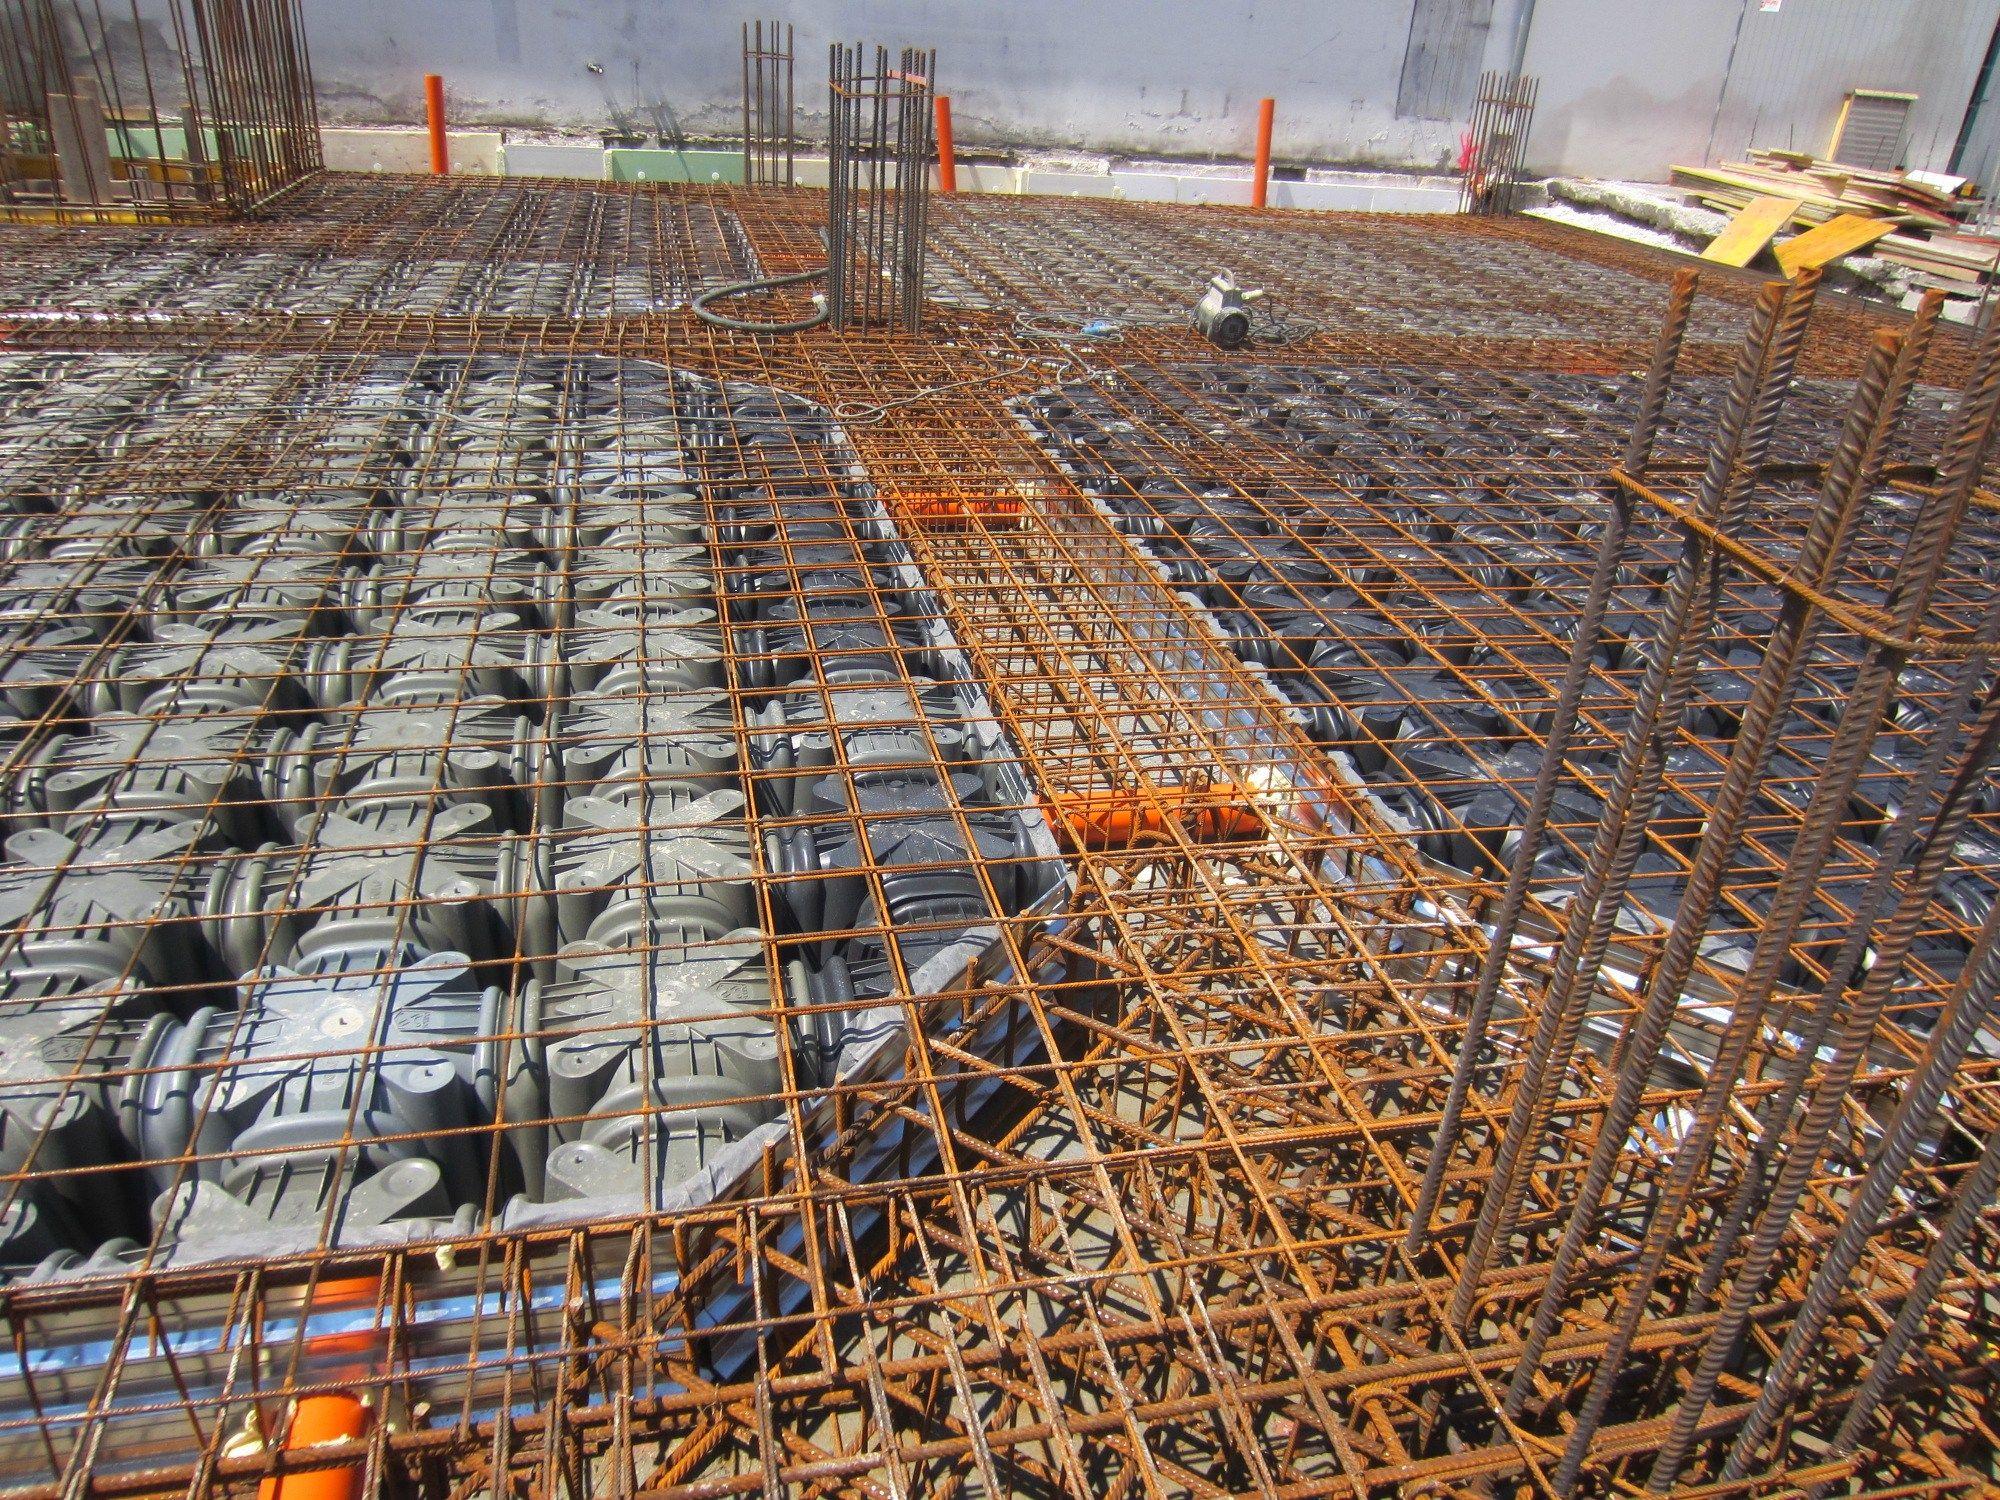 Cassaforma a perdere flashfond by flashfond for Igloo edilizia prezzi